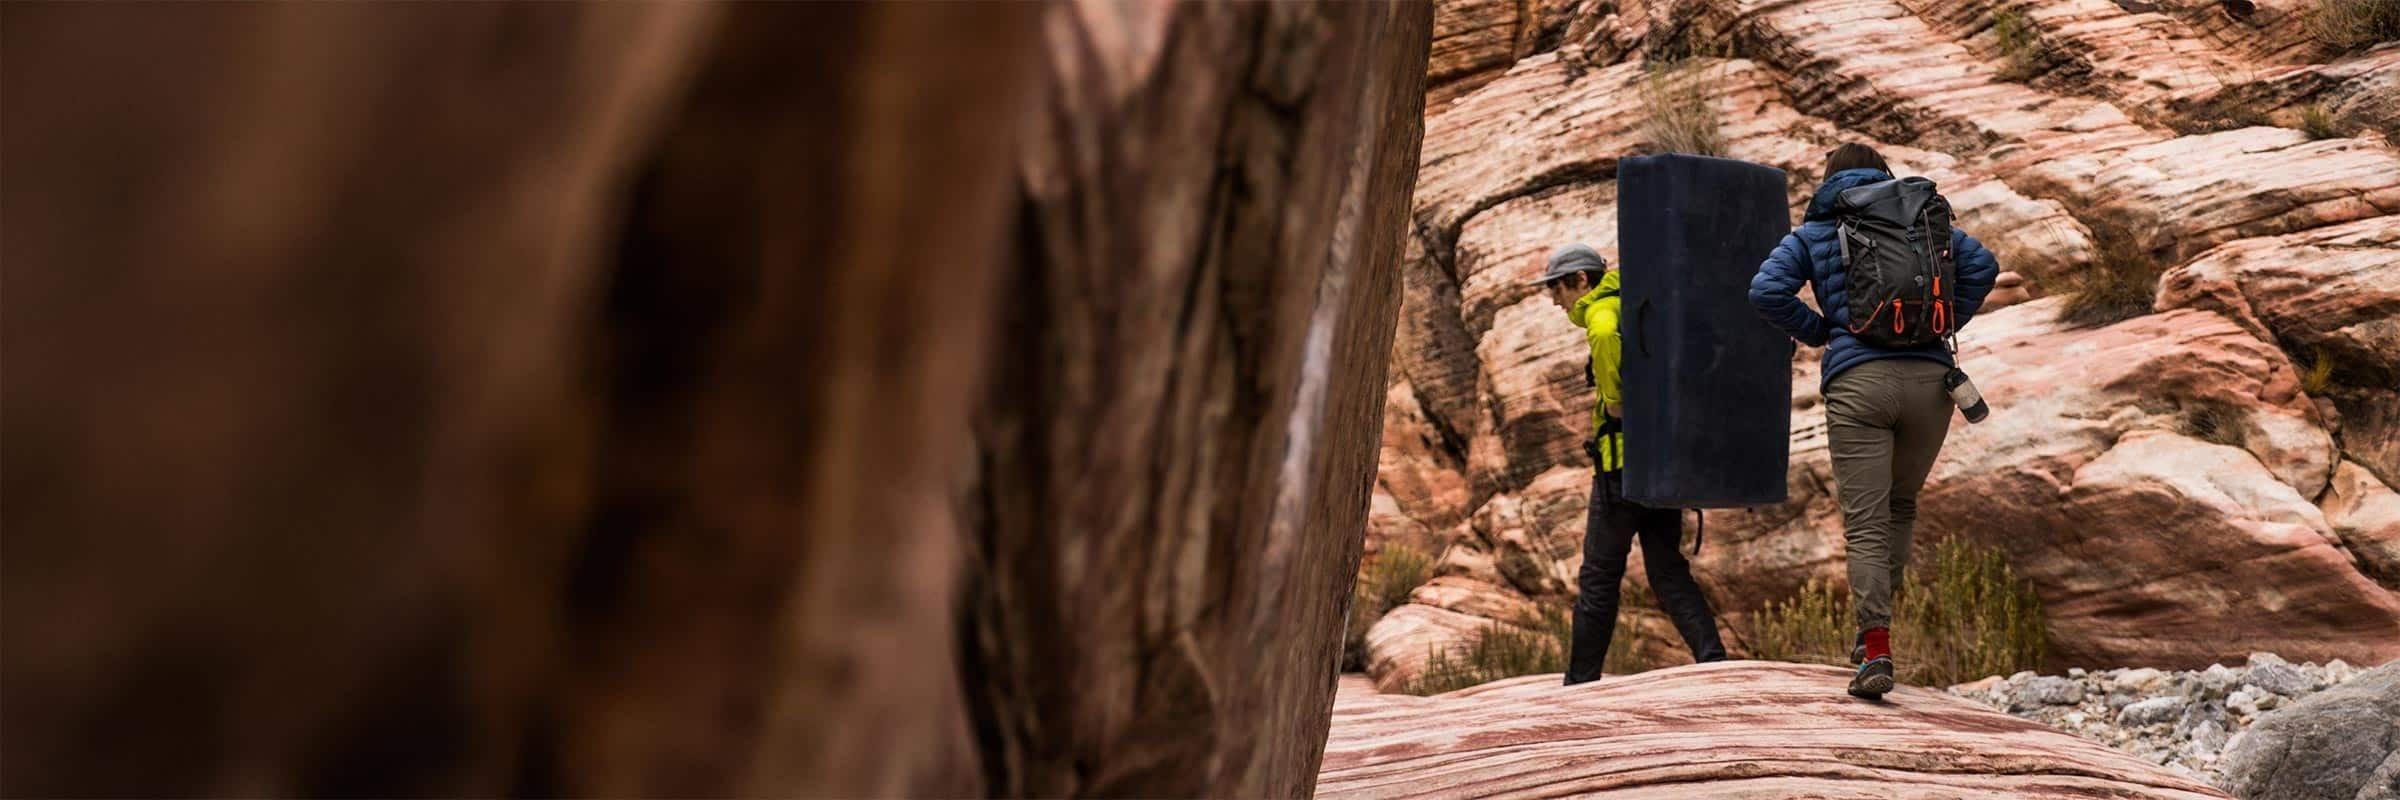 44ab8ebf7 Discover the AP Collection by Mountain Hardwear - Biking, Hiking ...